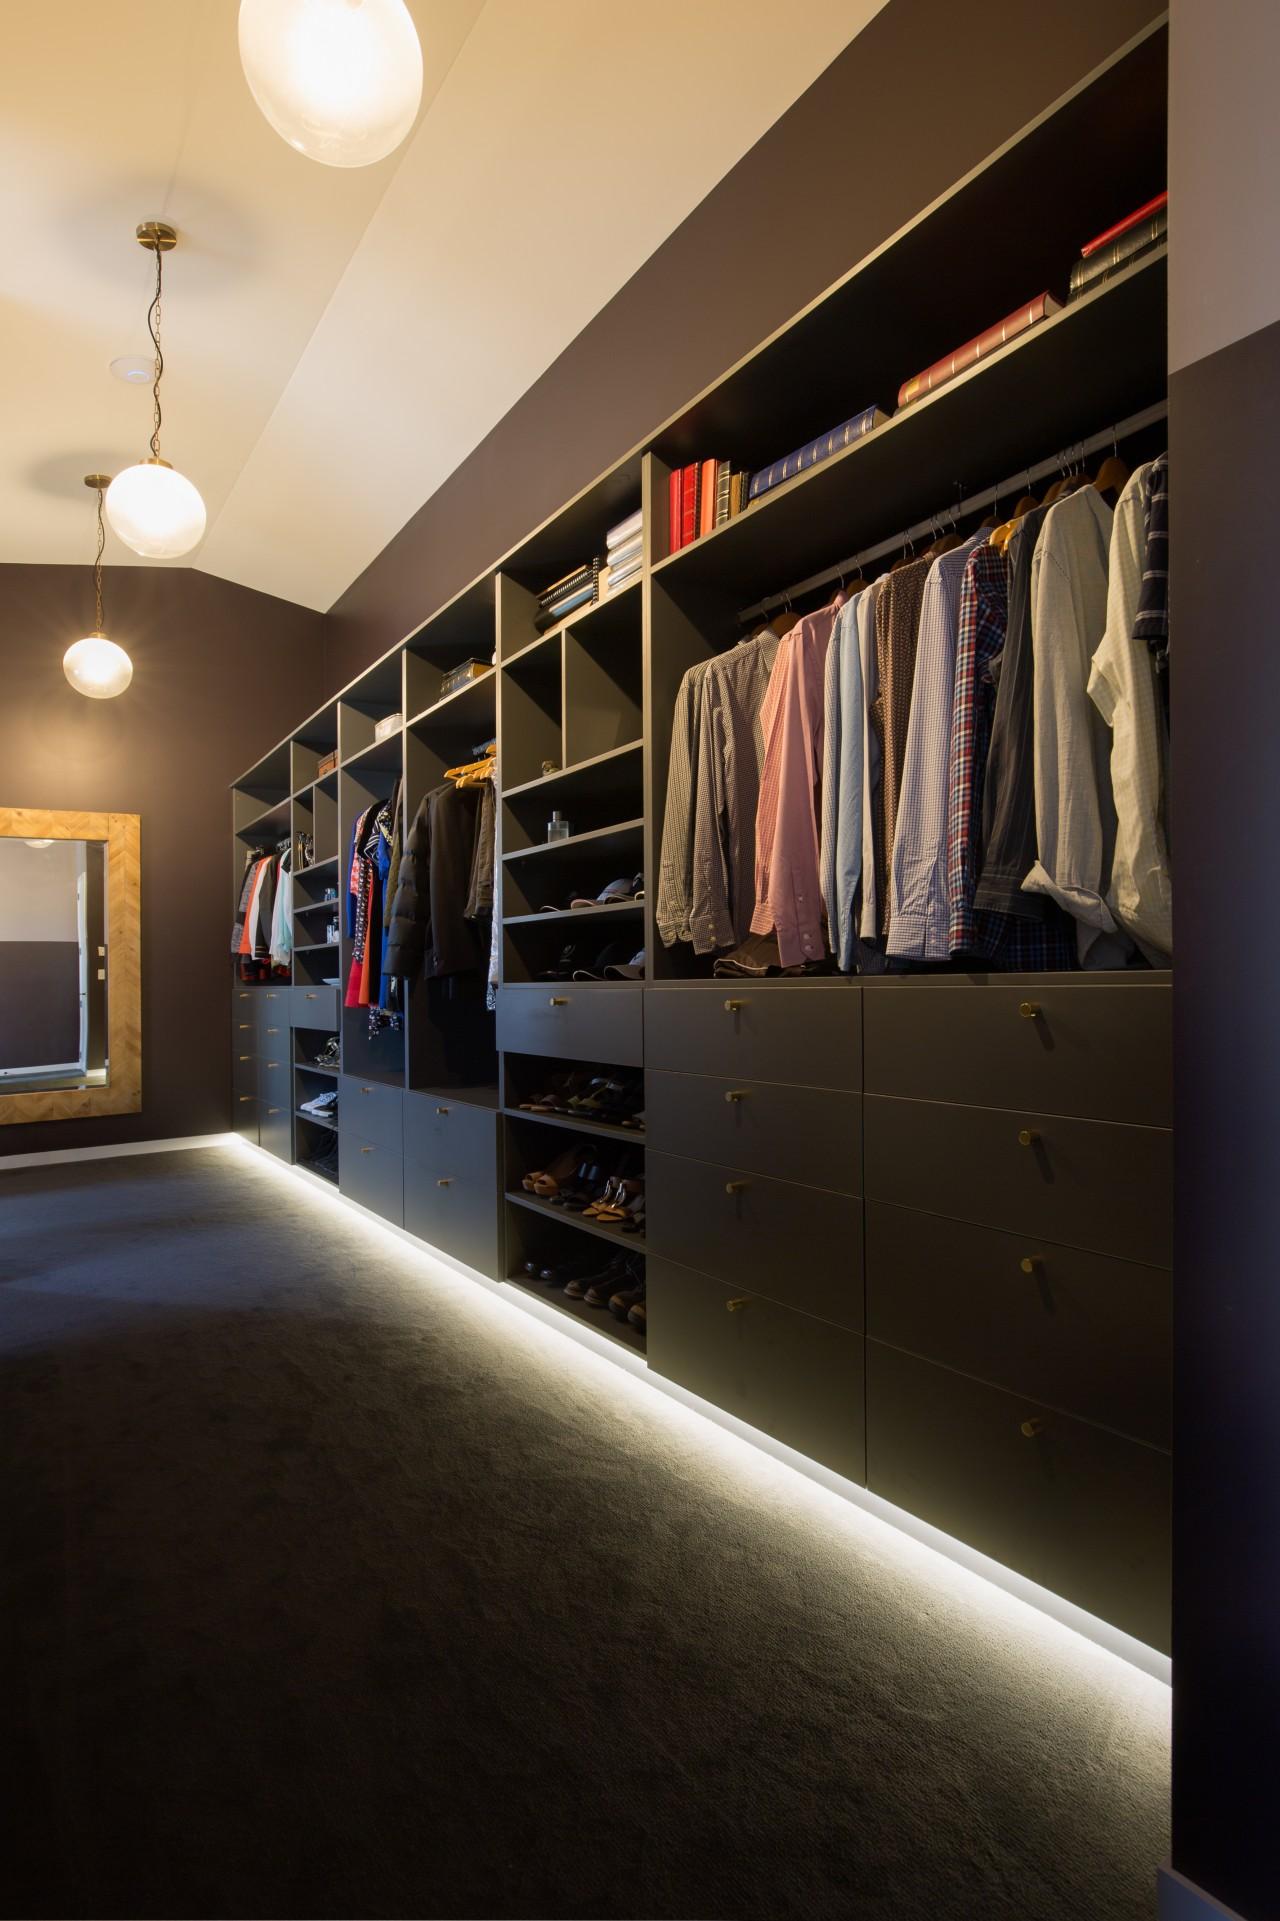 步入式衣帽间空间布局讲究,置物架、橱柜、衣架的位置都十分合理。 closet, furniture, interior design, room, shelving, wall, wardrobe, black